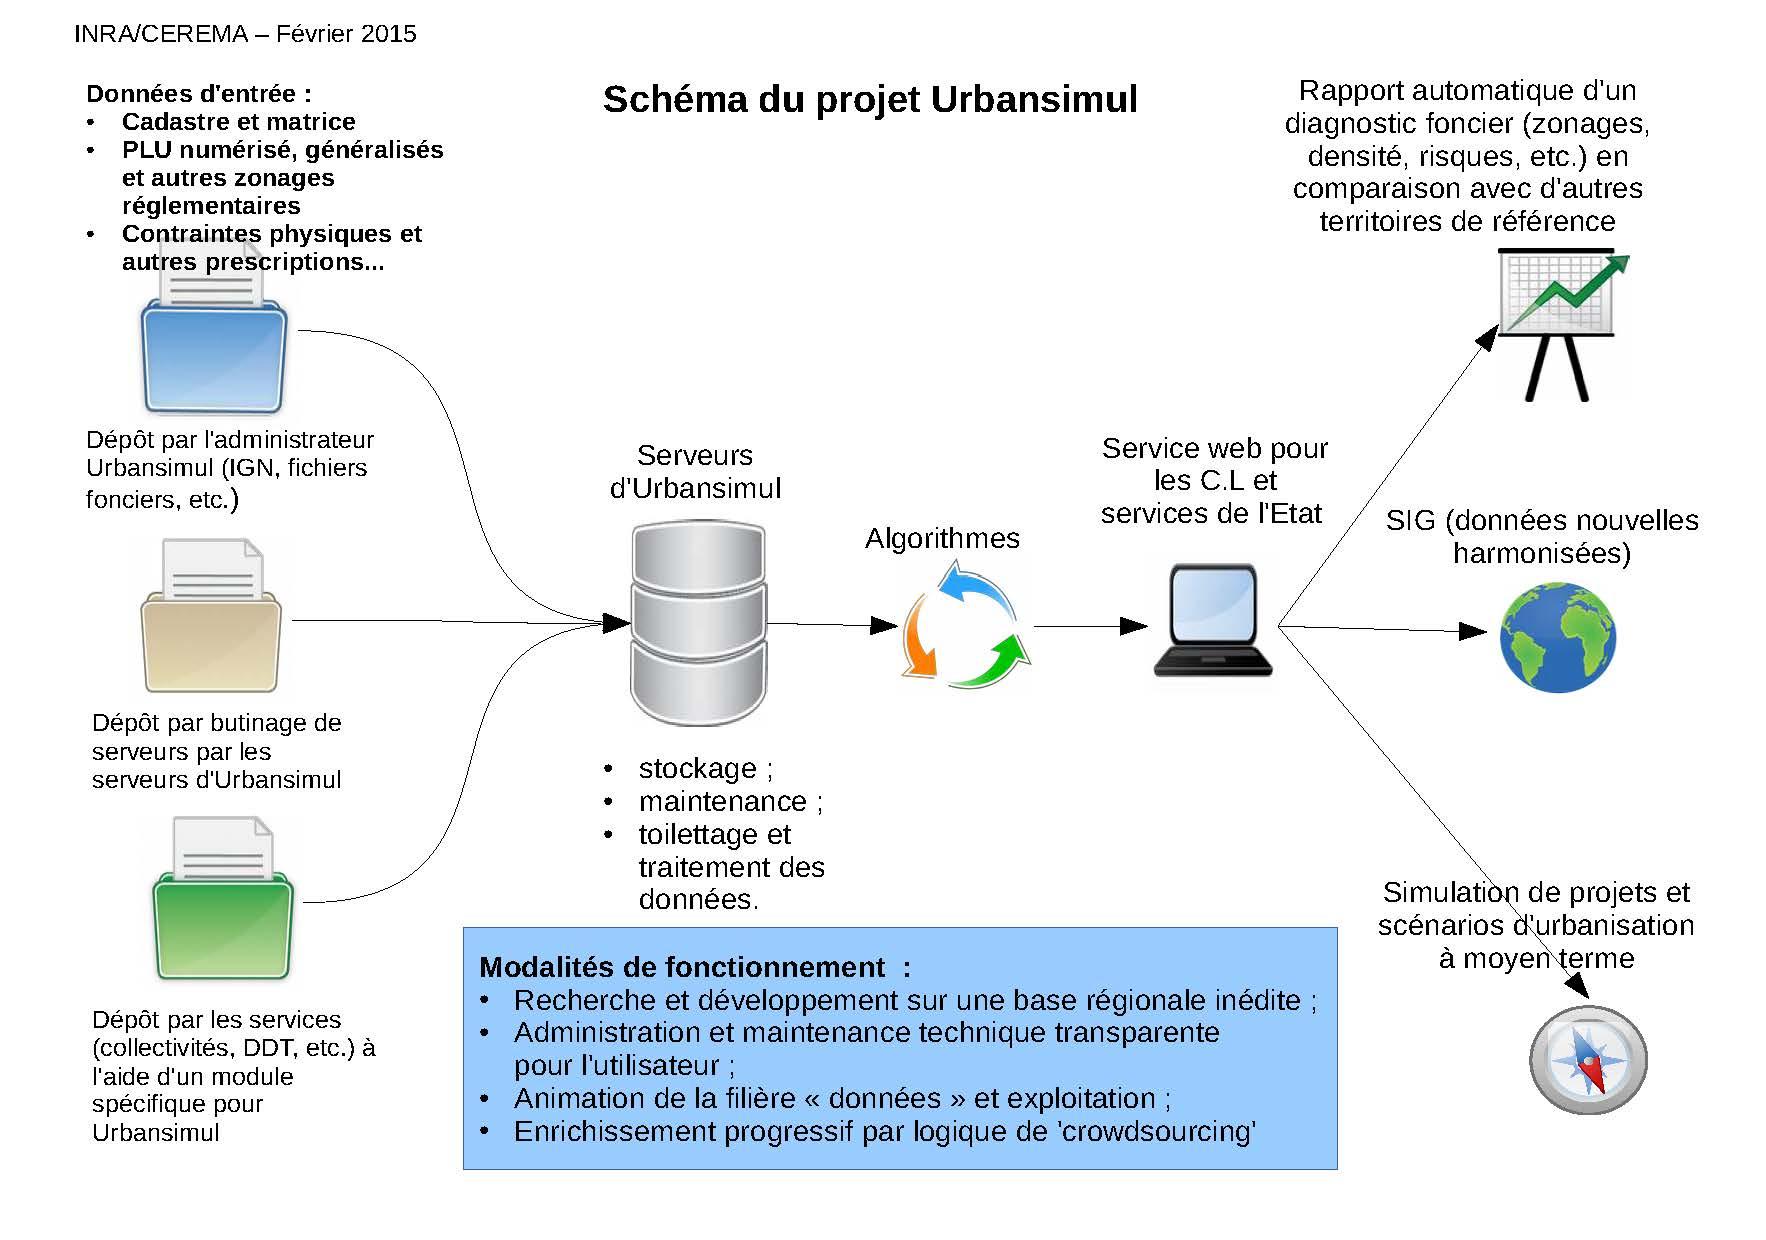 Schéma du projet URBANSIMUL